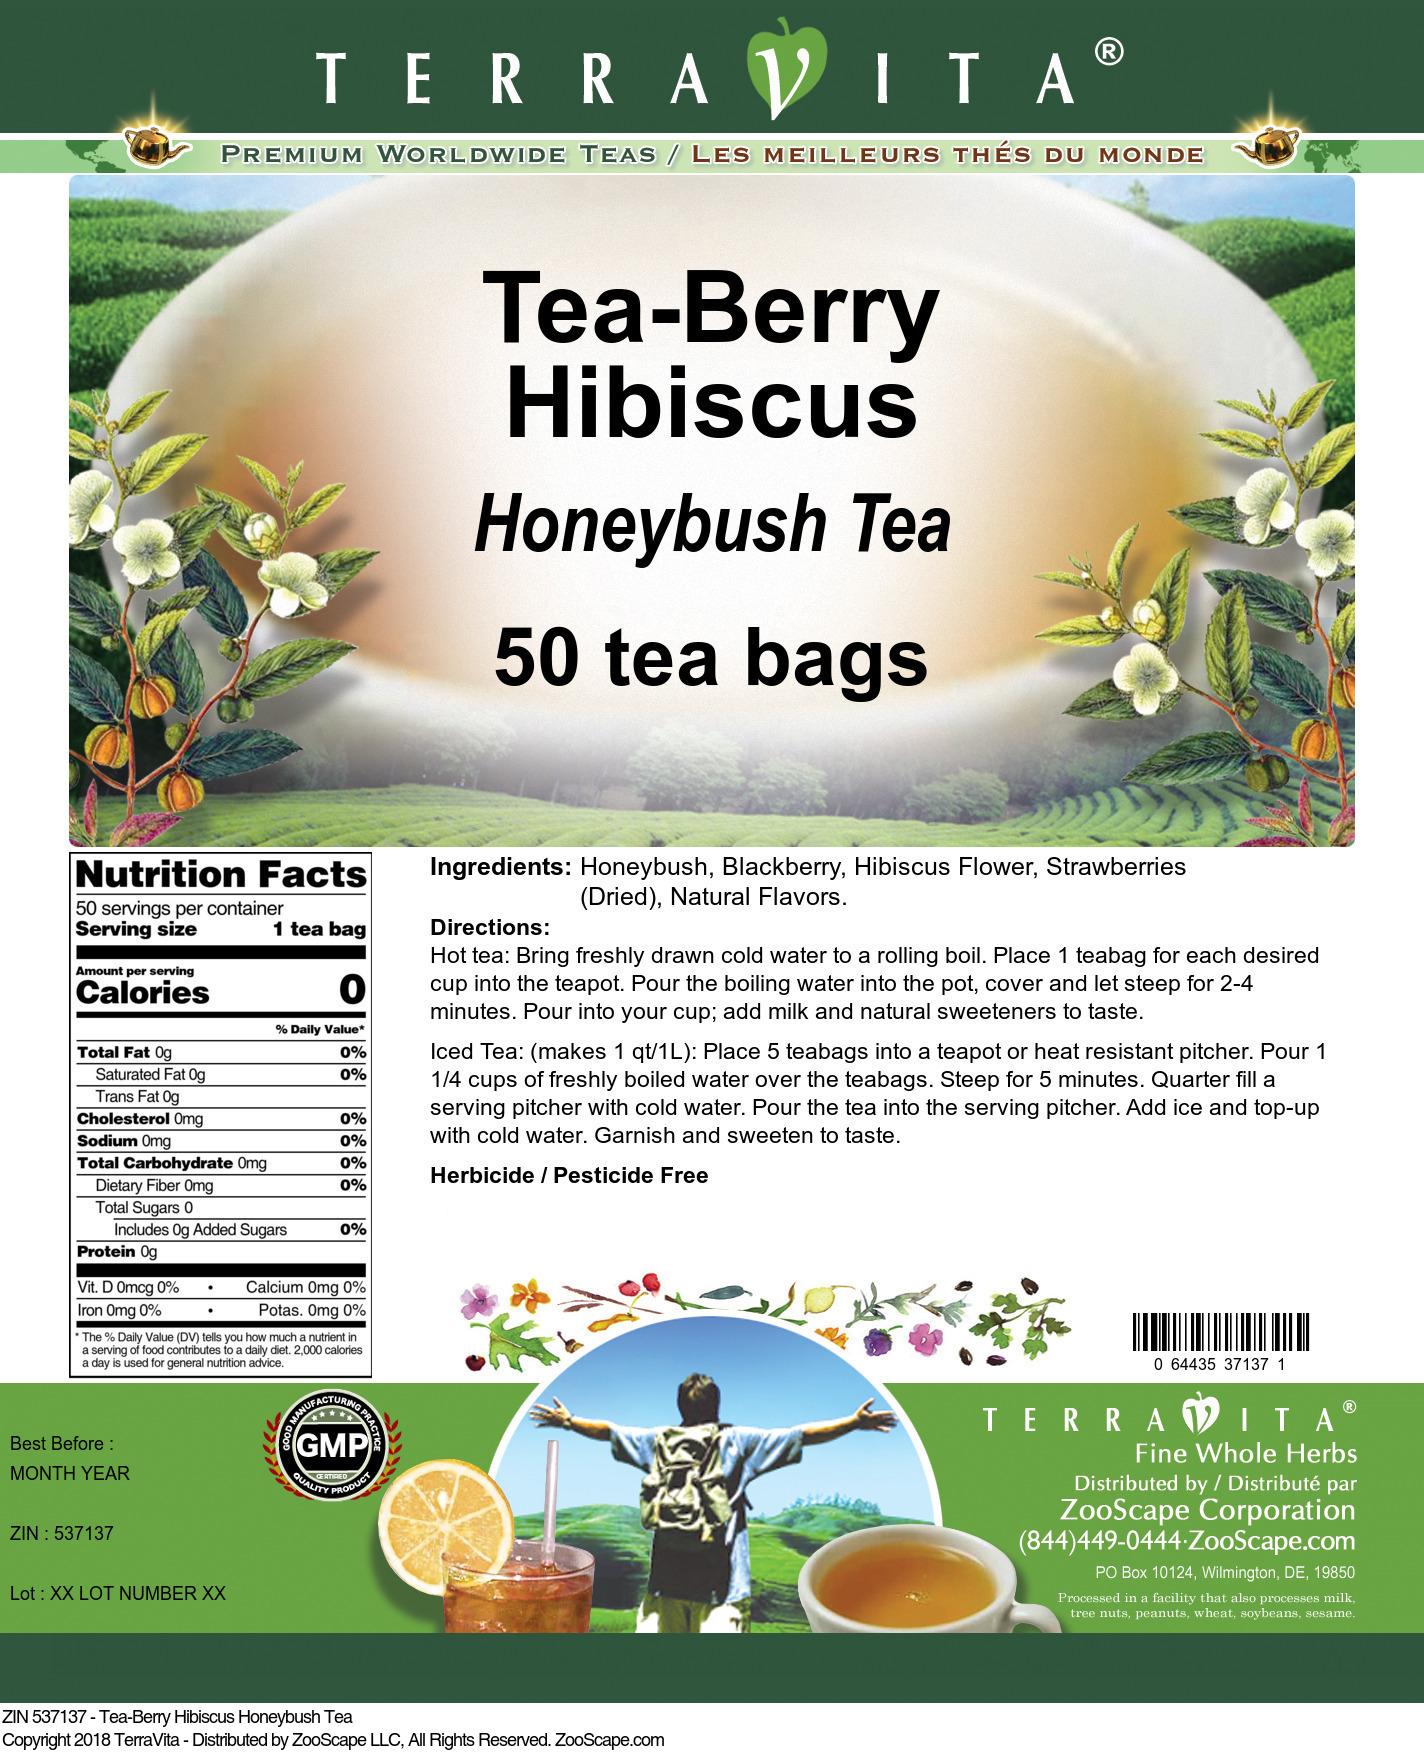 Tea-Berry Hibiscus Honeybush Tea